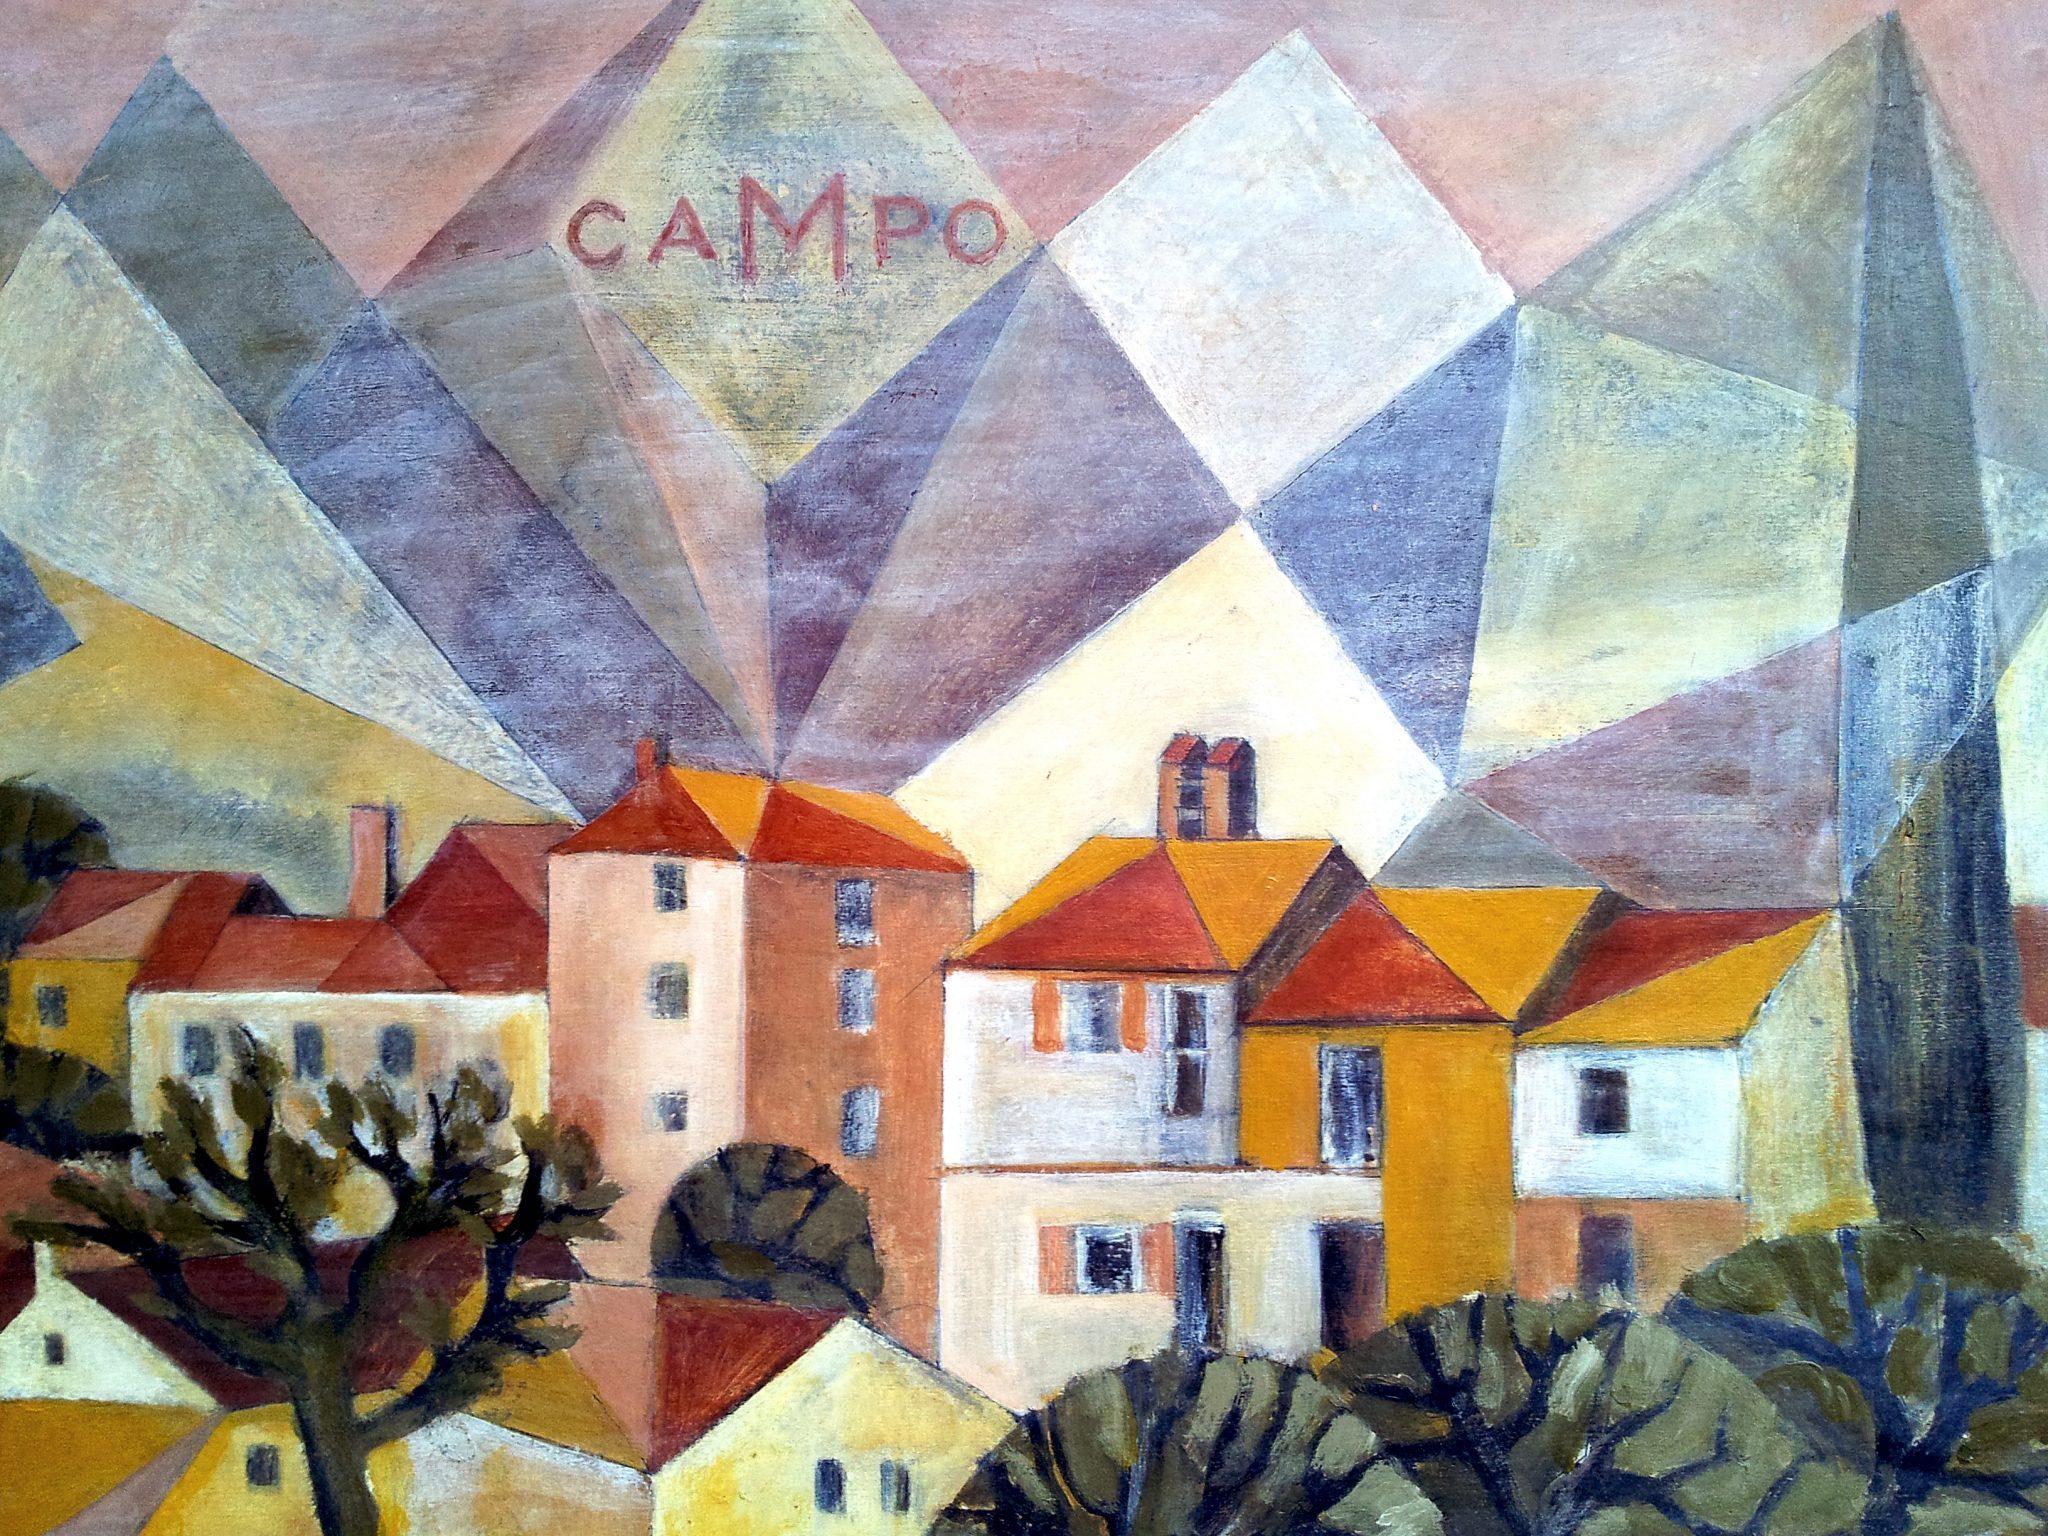 Het onzichtbare gevaar van Campo – C'è un pericolo, è invisibile